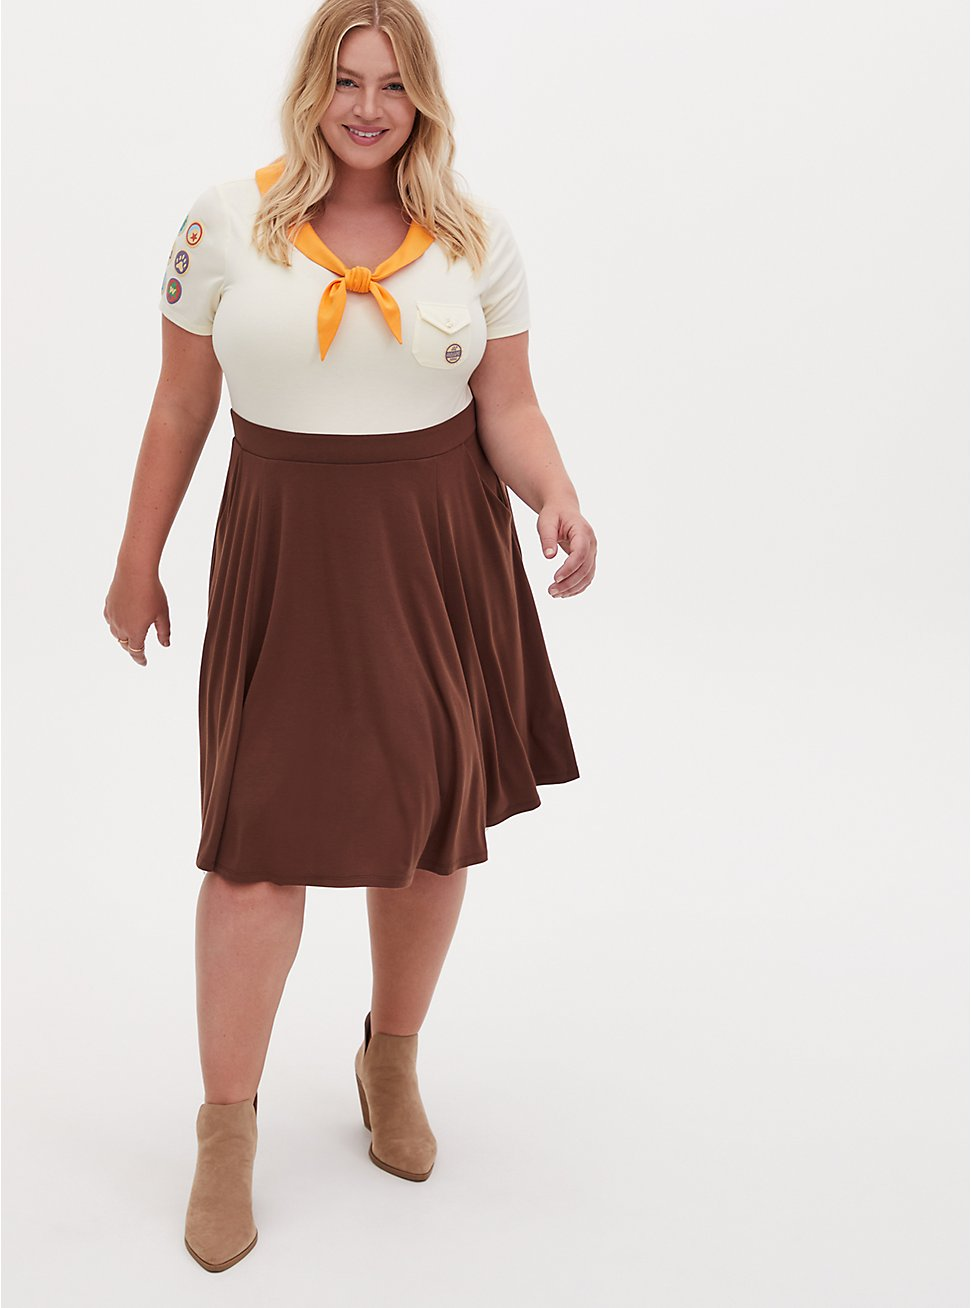 Disney Pixar Up Russel Wilderness Explorer Brown Skater Dress , BROWN  LIGHT BROWN, hi-res